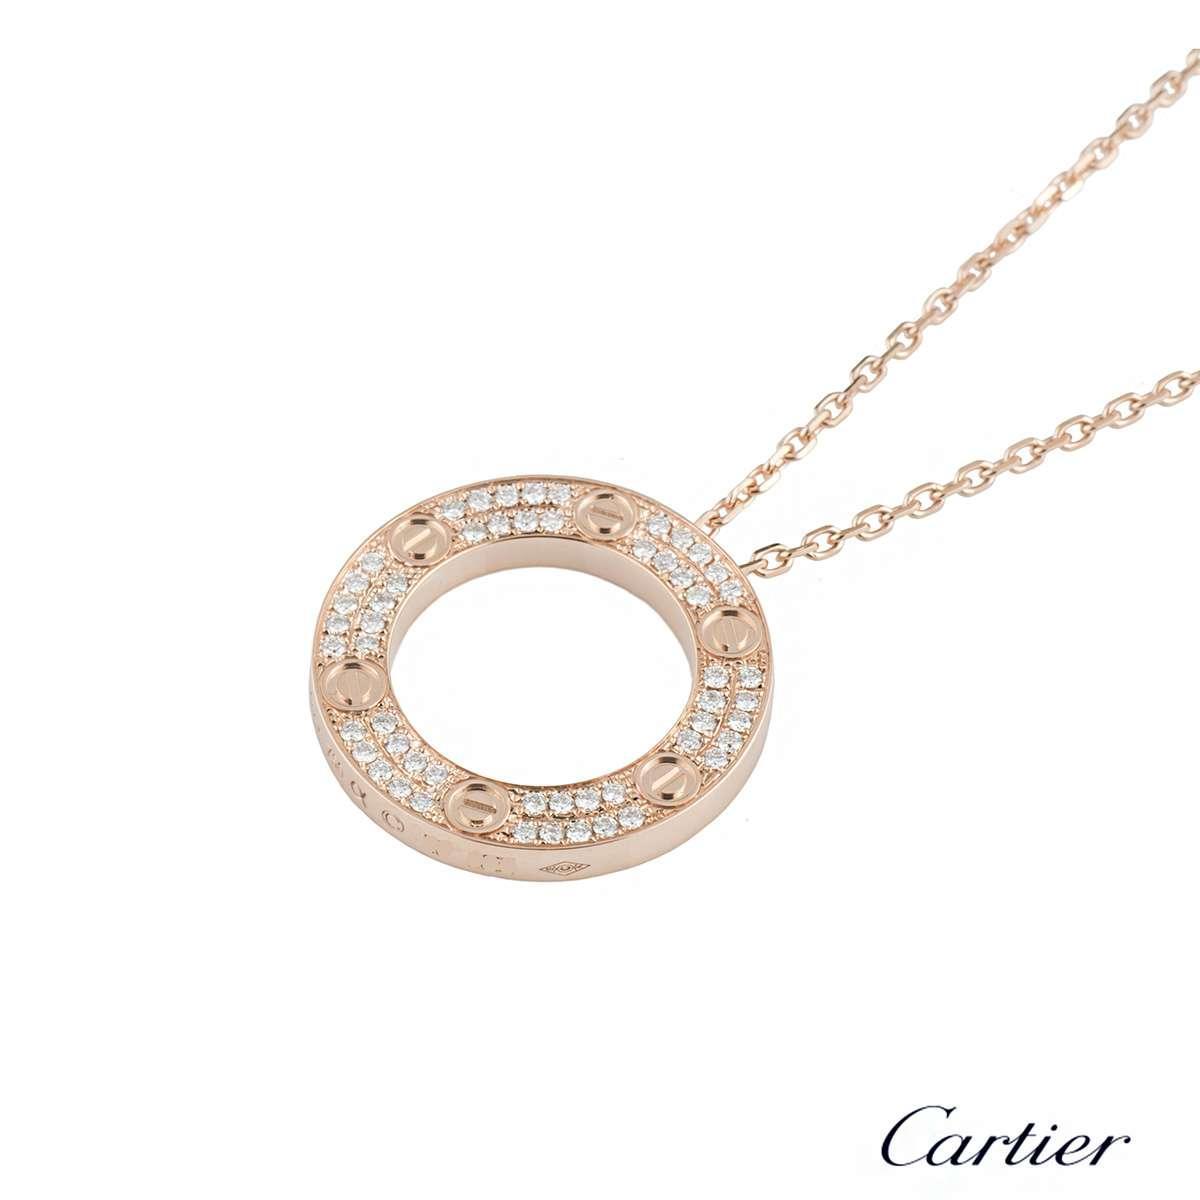 Cartier rose gold diamond love pendant b7224527 rich diamonds of cartier rose gold diamond love pendant b7224527 aloadofball Image collections